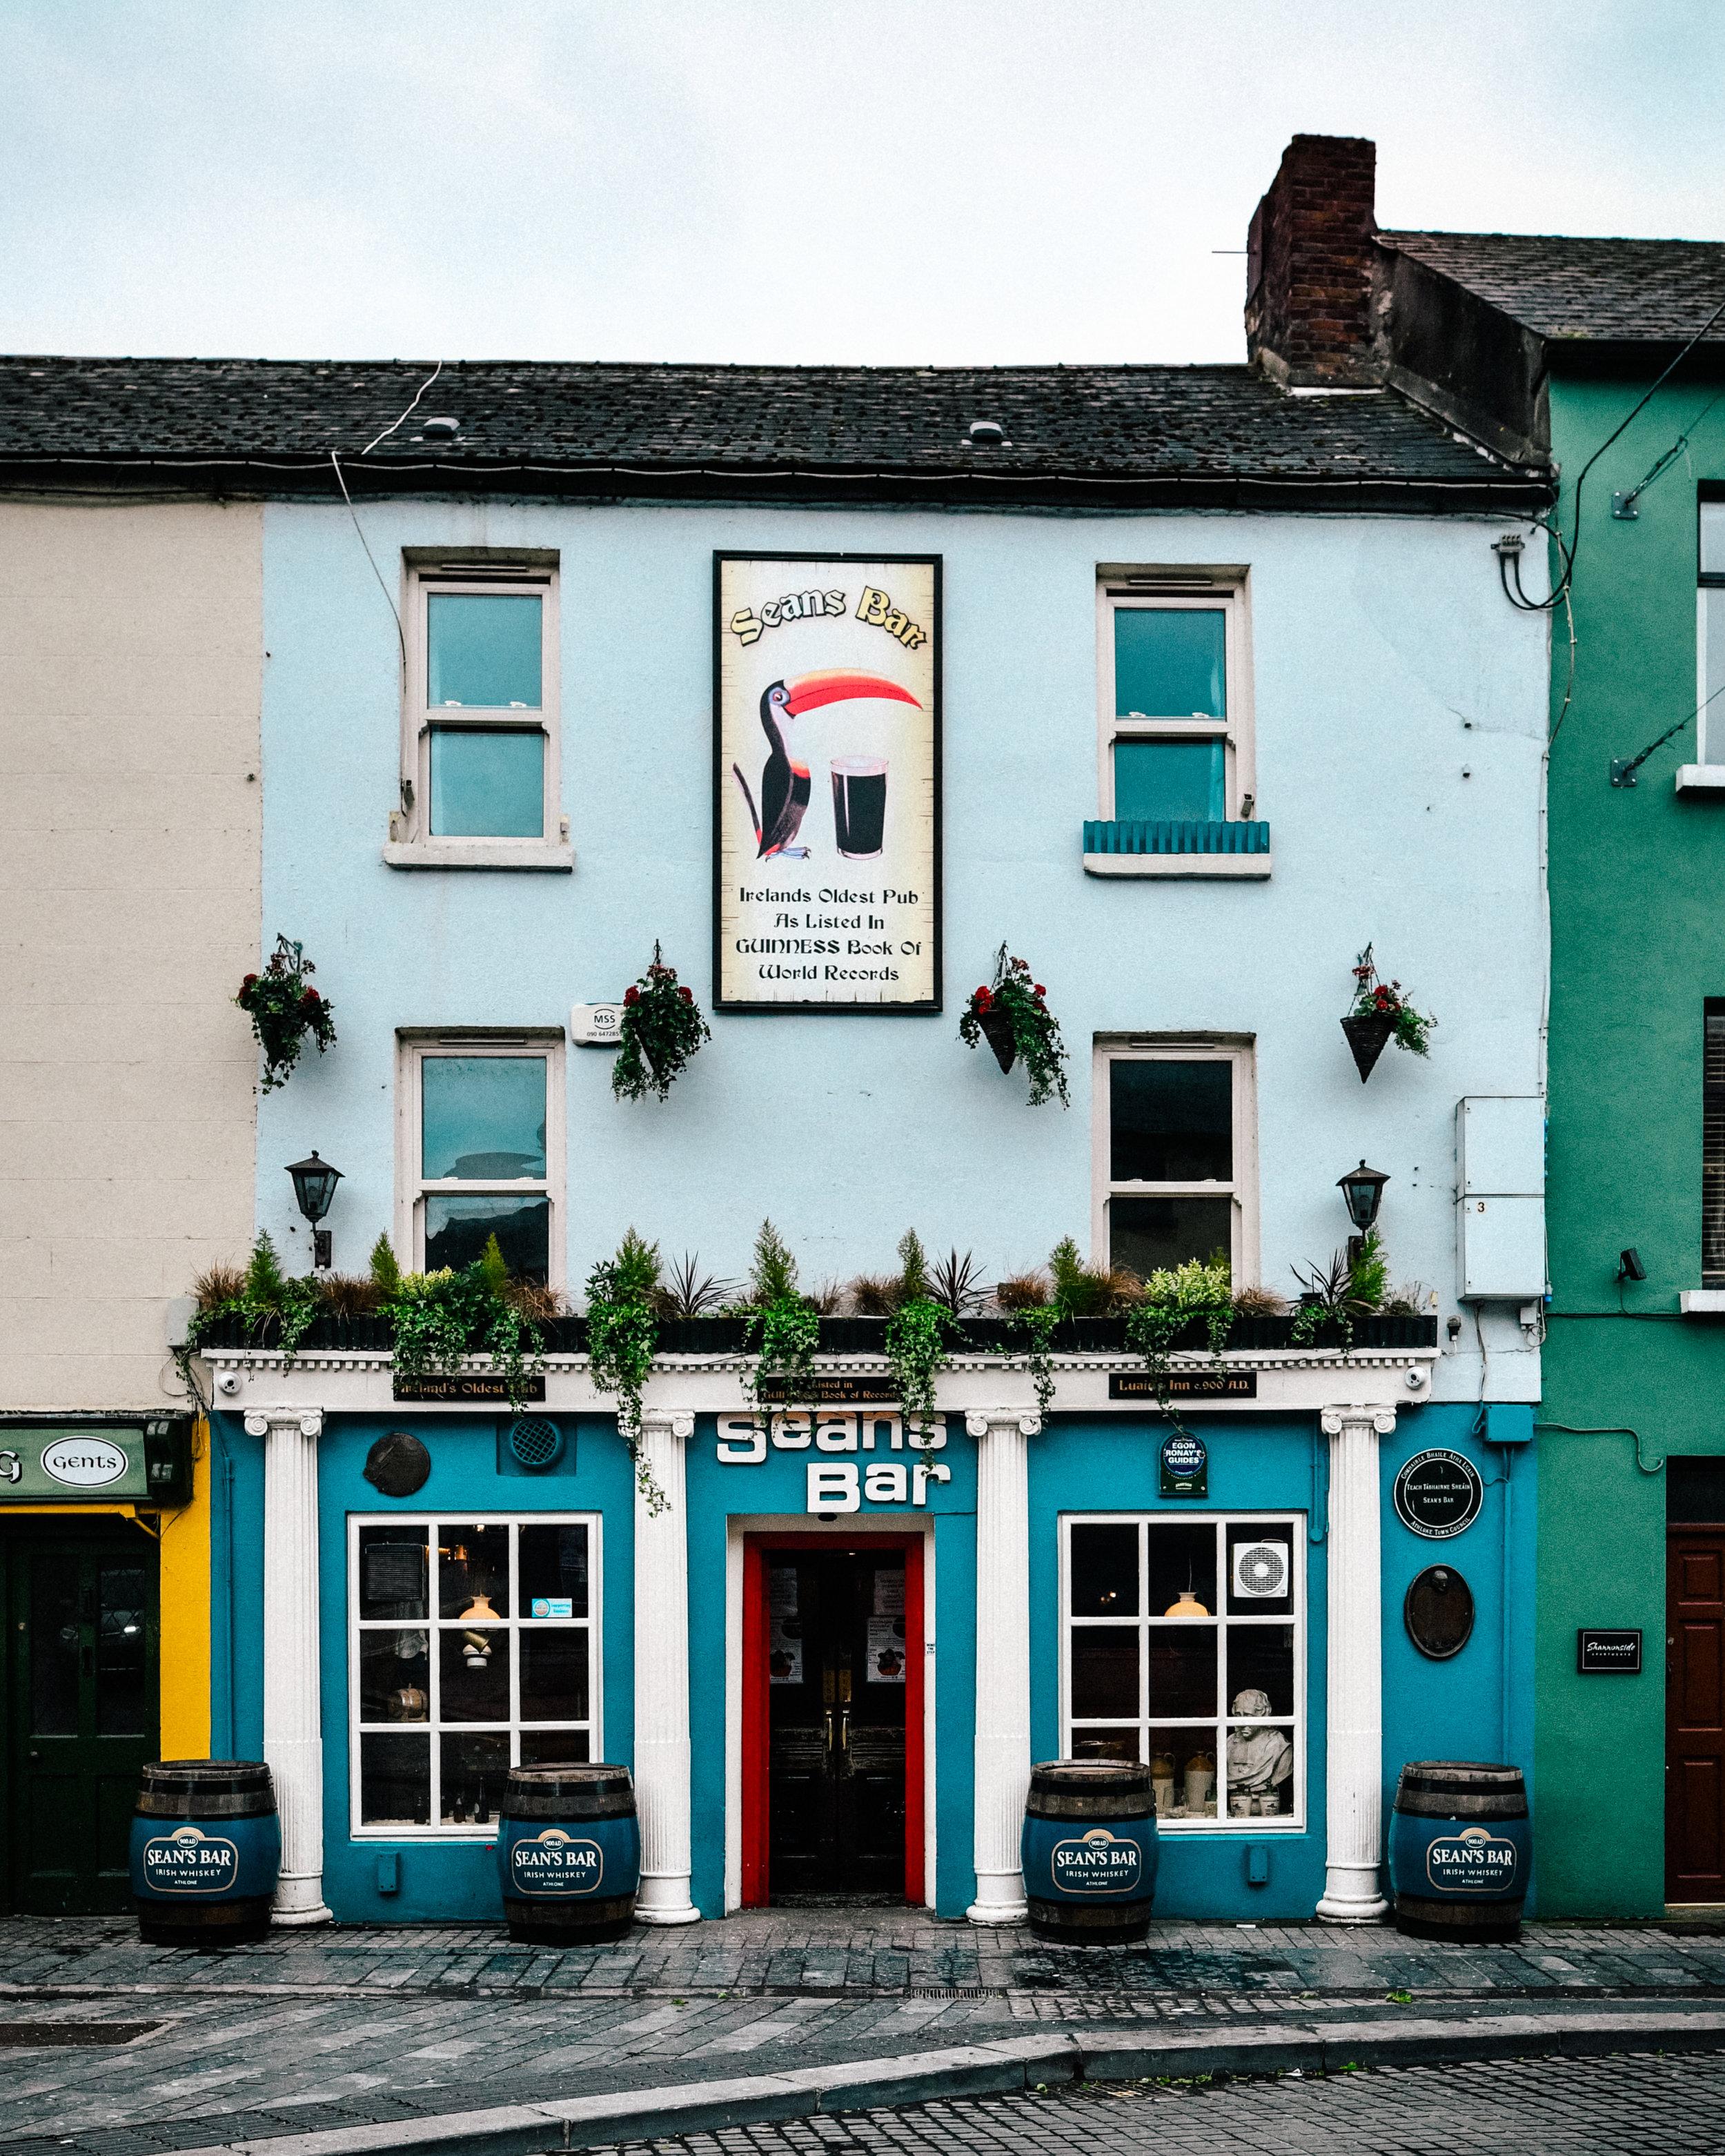 The oldest bar in the world - Sean's Bar, Athlone